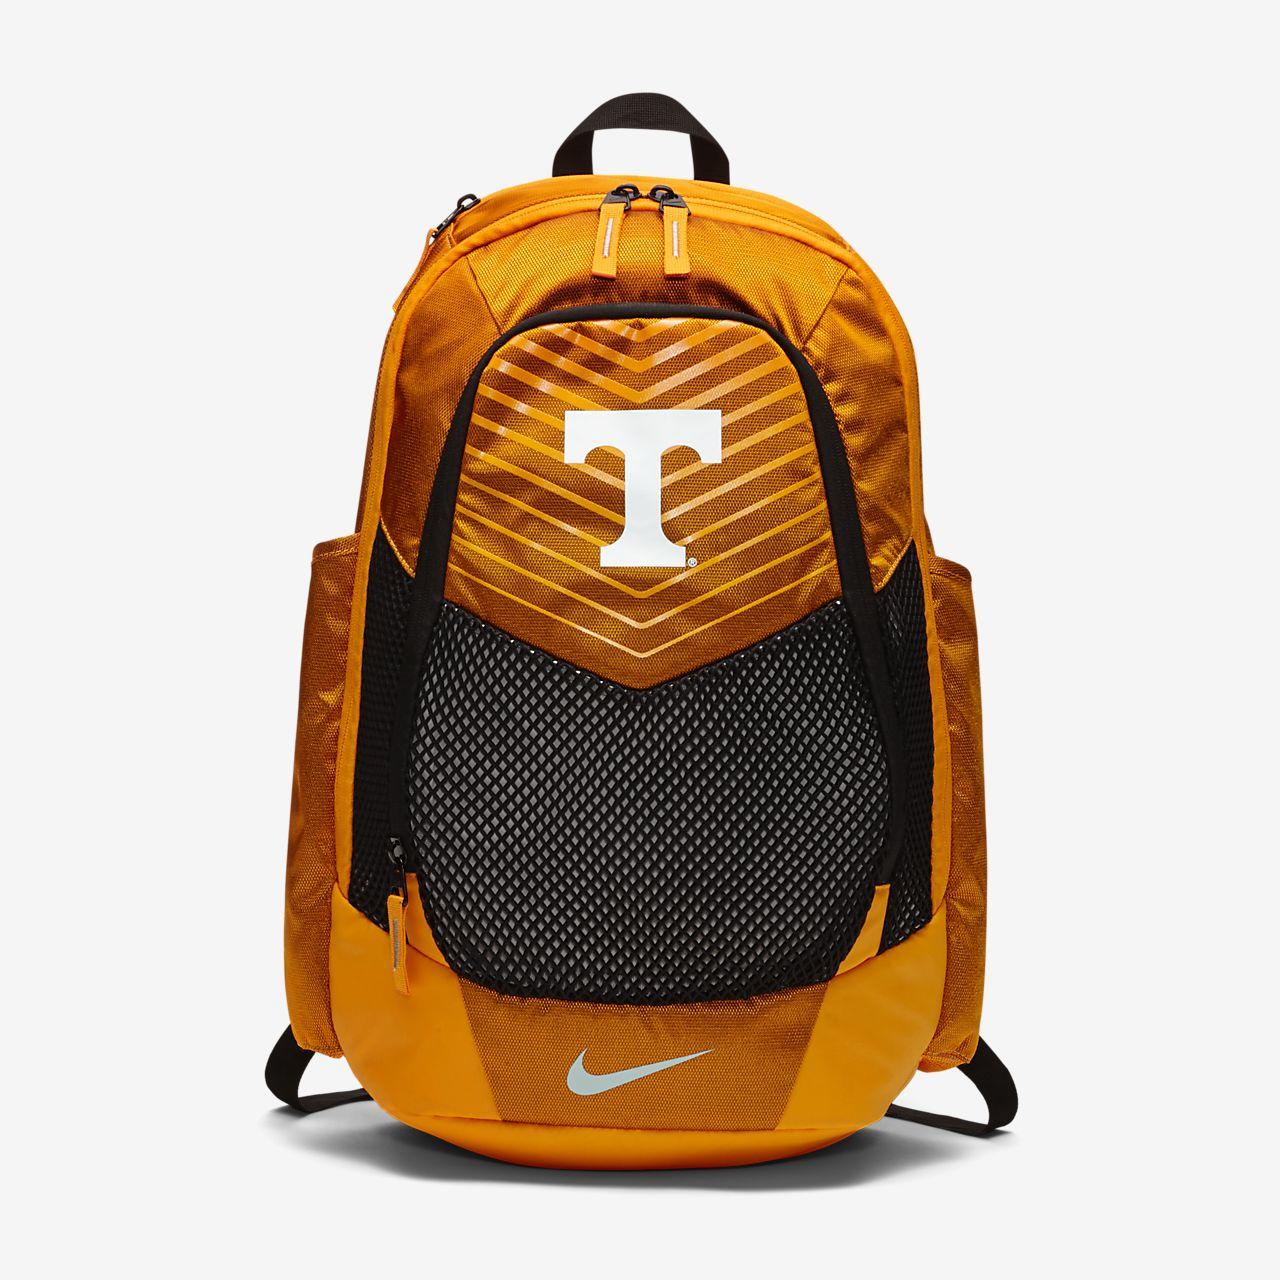 e52b9c77fcd Nike Men Orange Black Max Air Vapor Printed Backpack. Nike College Vapor  Power Tennessee Backpack. Nike College Vapor Power Tennessee Backpack Com